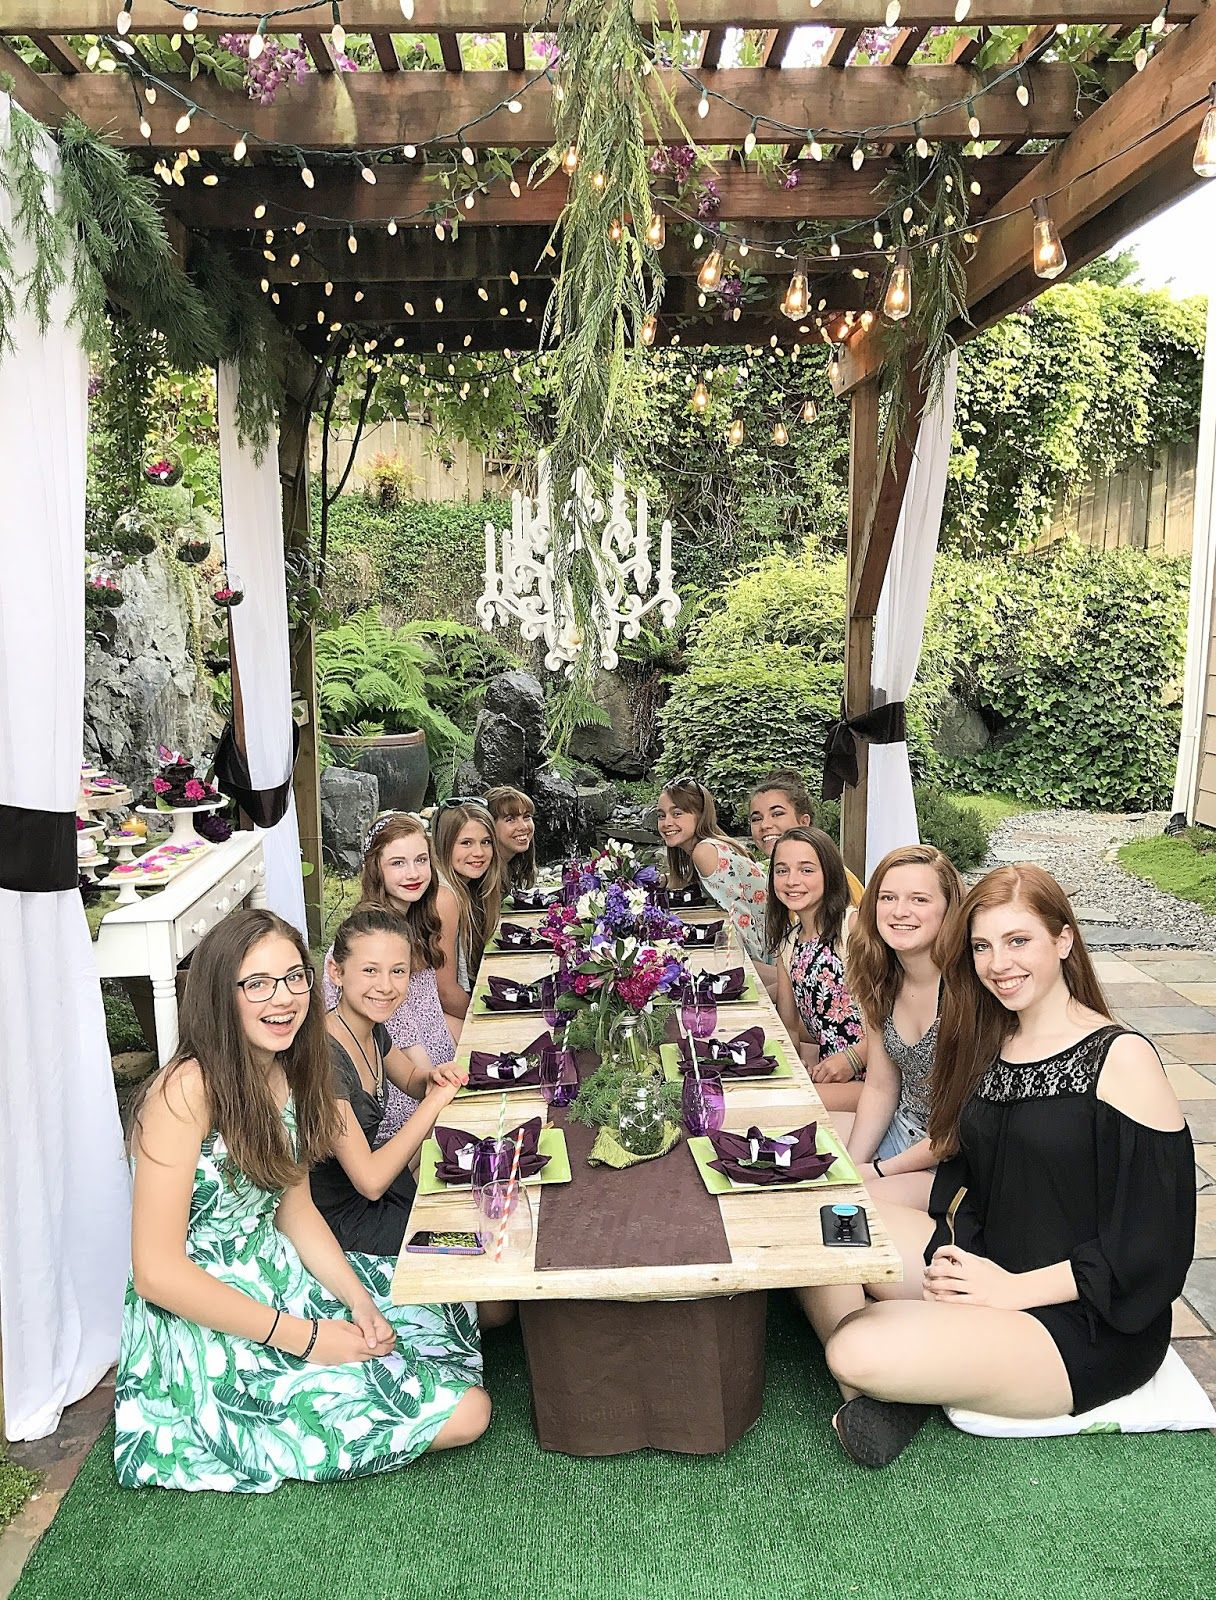 Midsummer Night Soiree Teenage Birthday Party 13th Birthday Party Ideas For Girls Boho Birthday Party